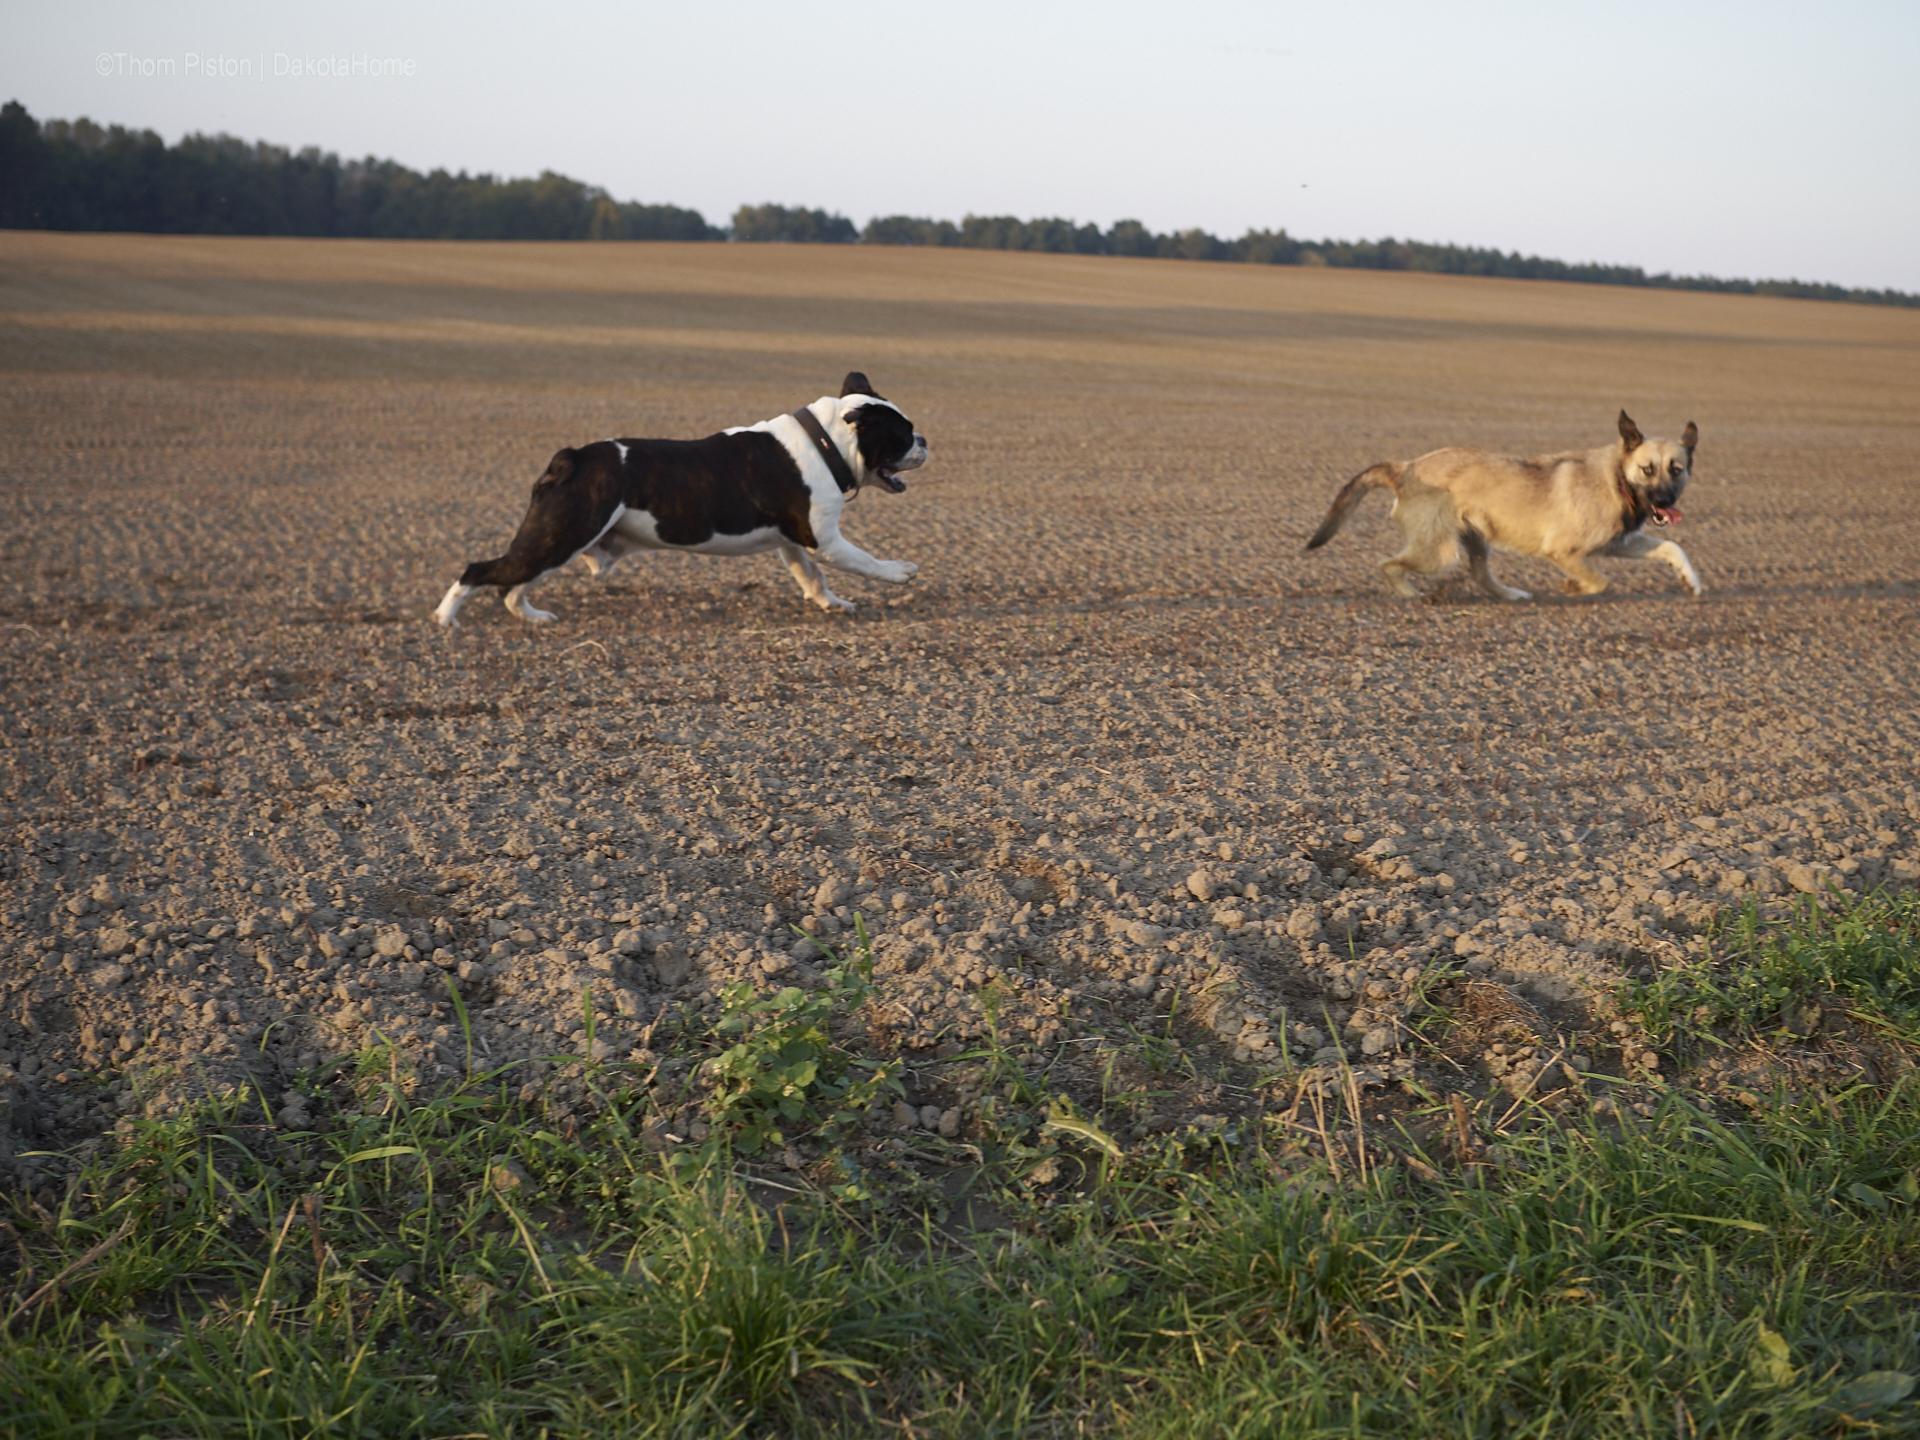 Alwin, Bulldog, Bulldogge, English bulldog, Oldenglishbulldog, englishbulldog,